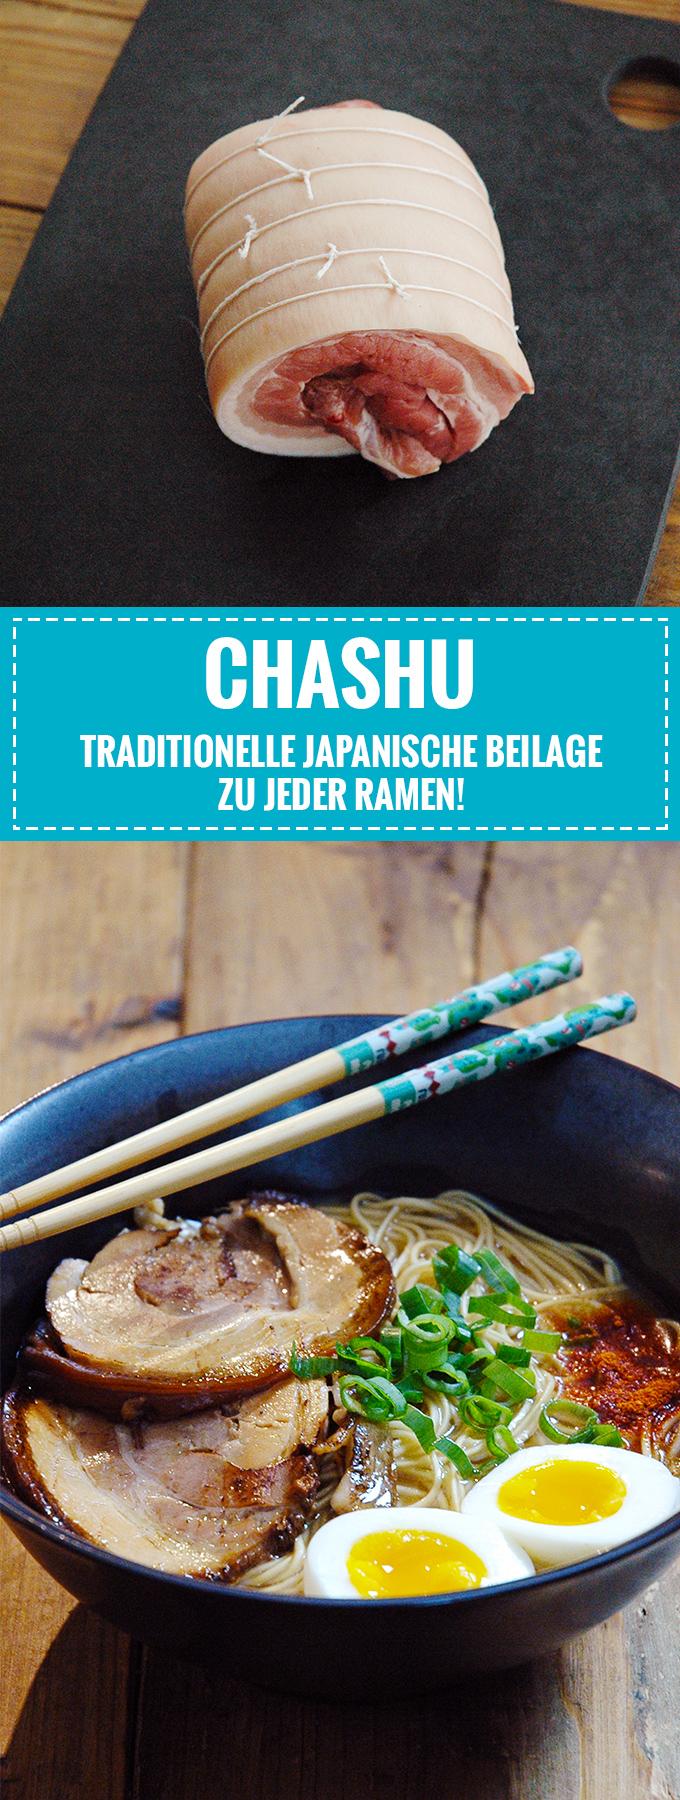 Chashu – Japanischer Schweinebauch für eure Ramen! // Rezept auf Knabberkult.de